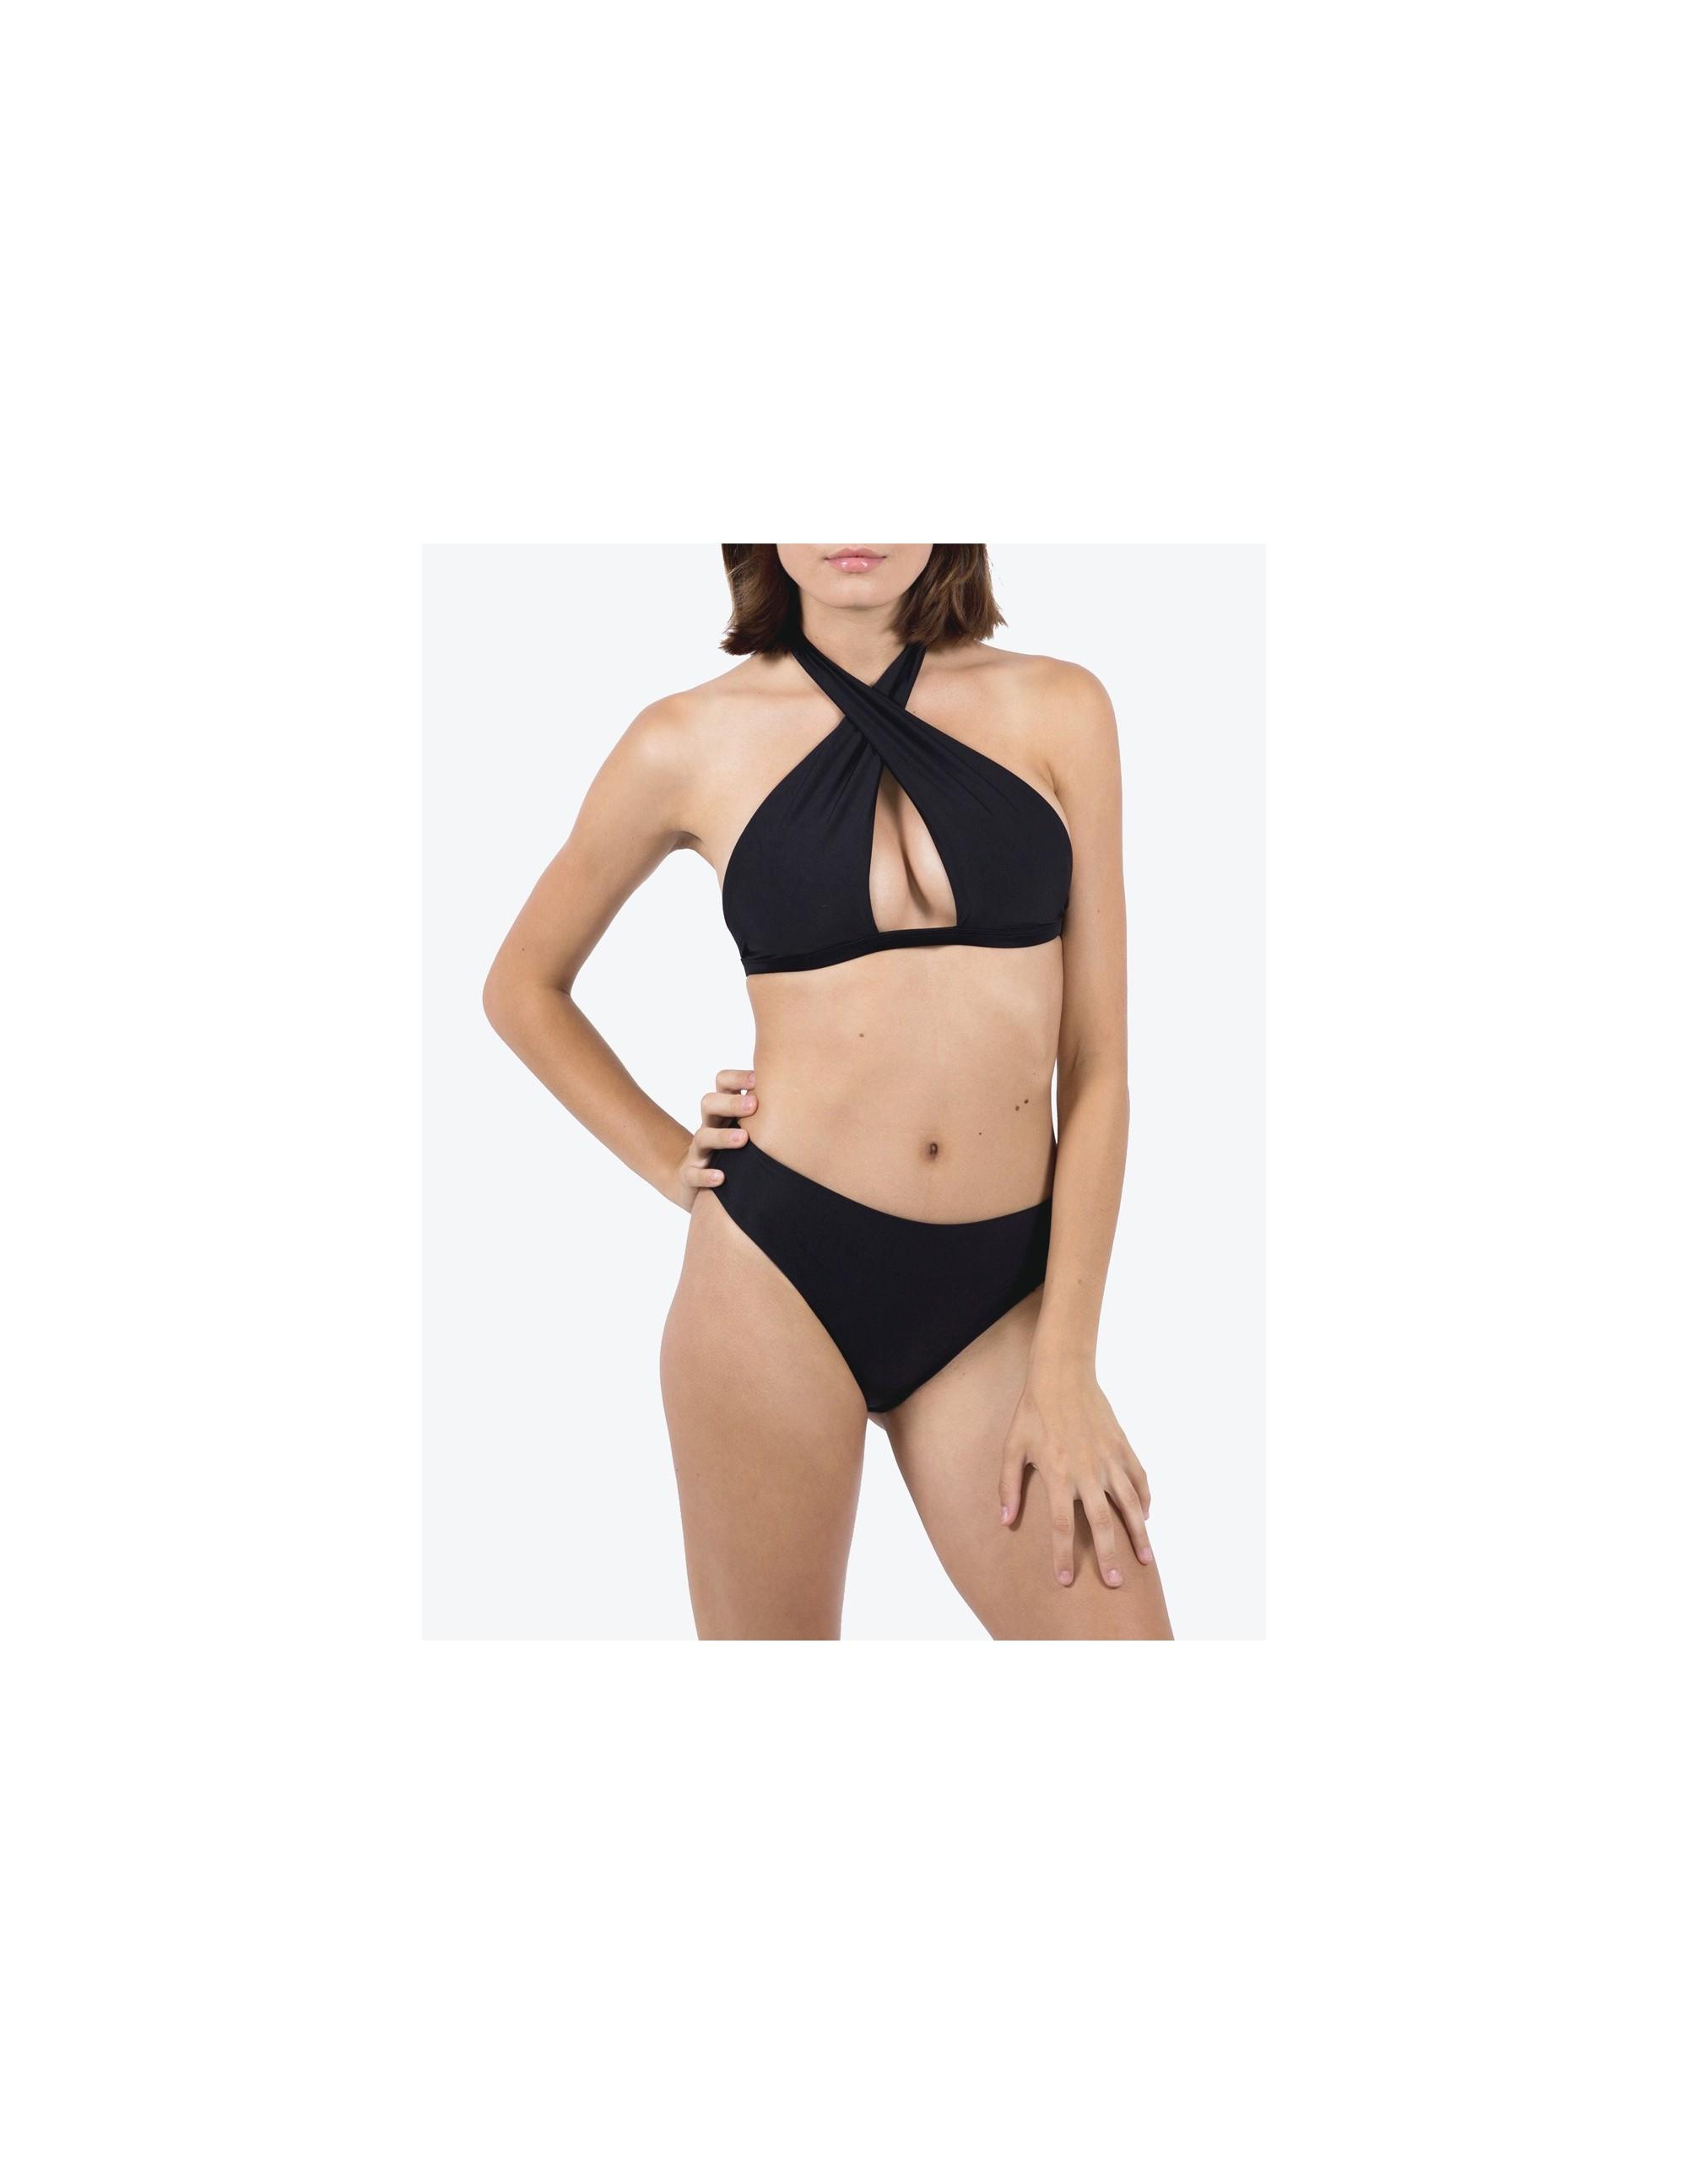 CONTA bikini top - MATTE  BLACK